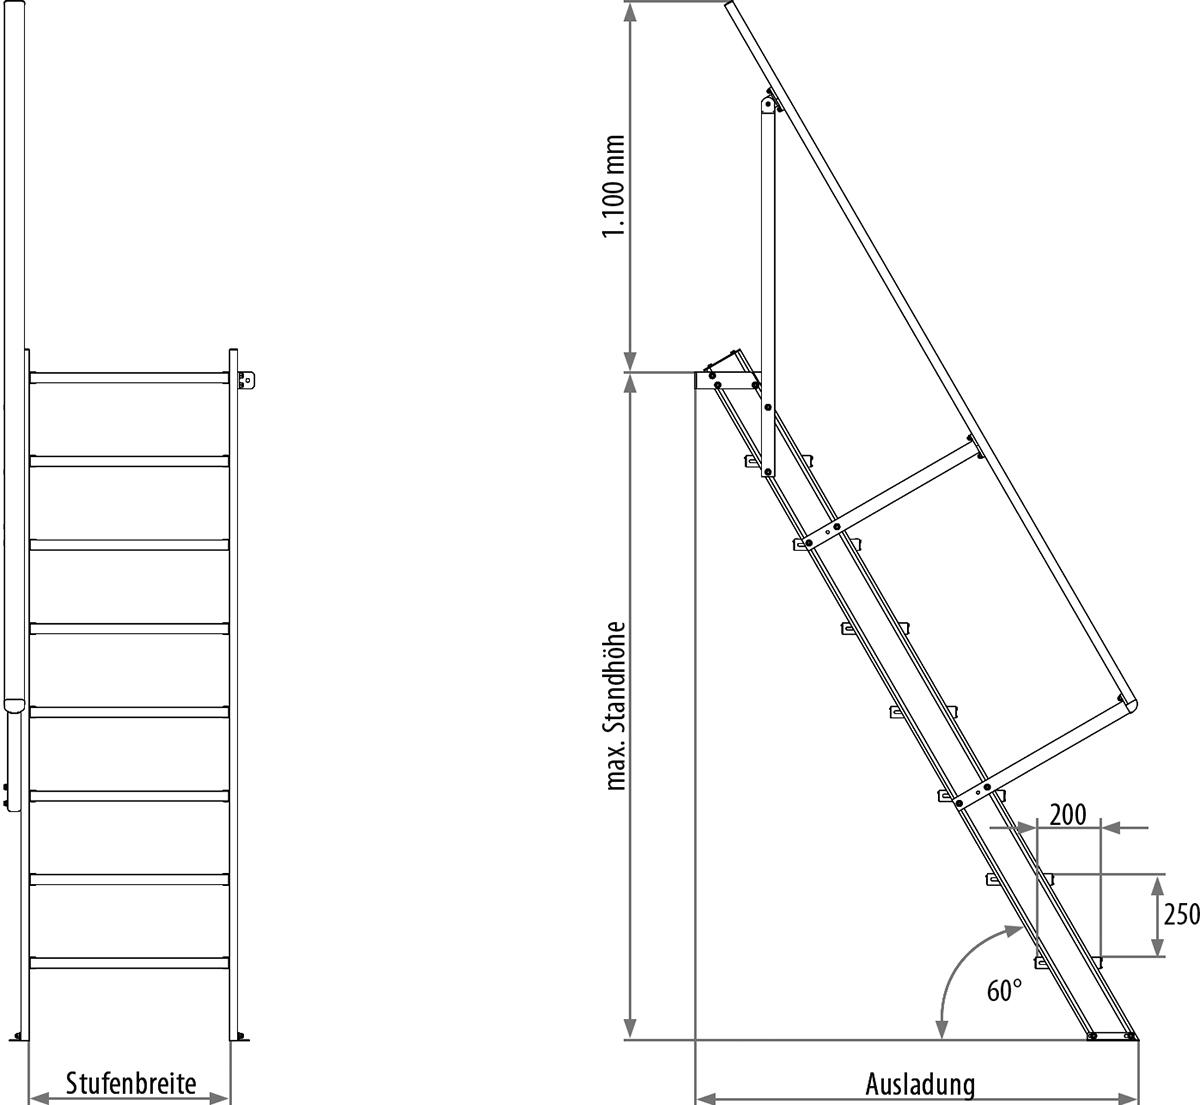 Hymer Treppe 60° 4 Stufen - 600 mm